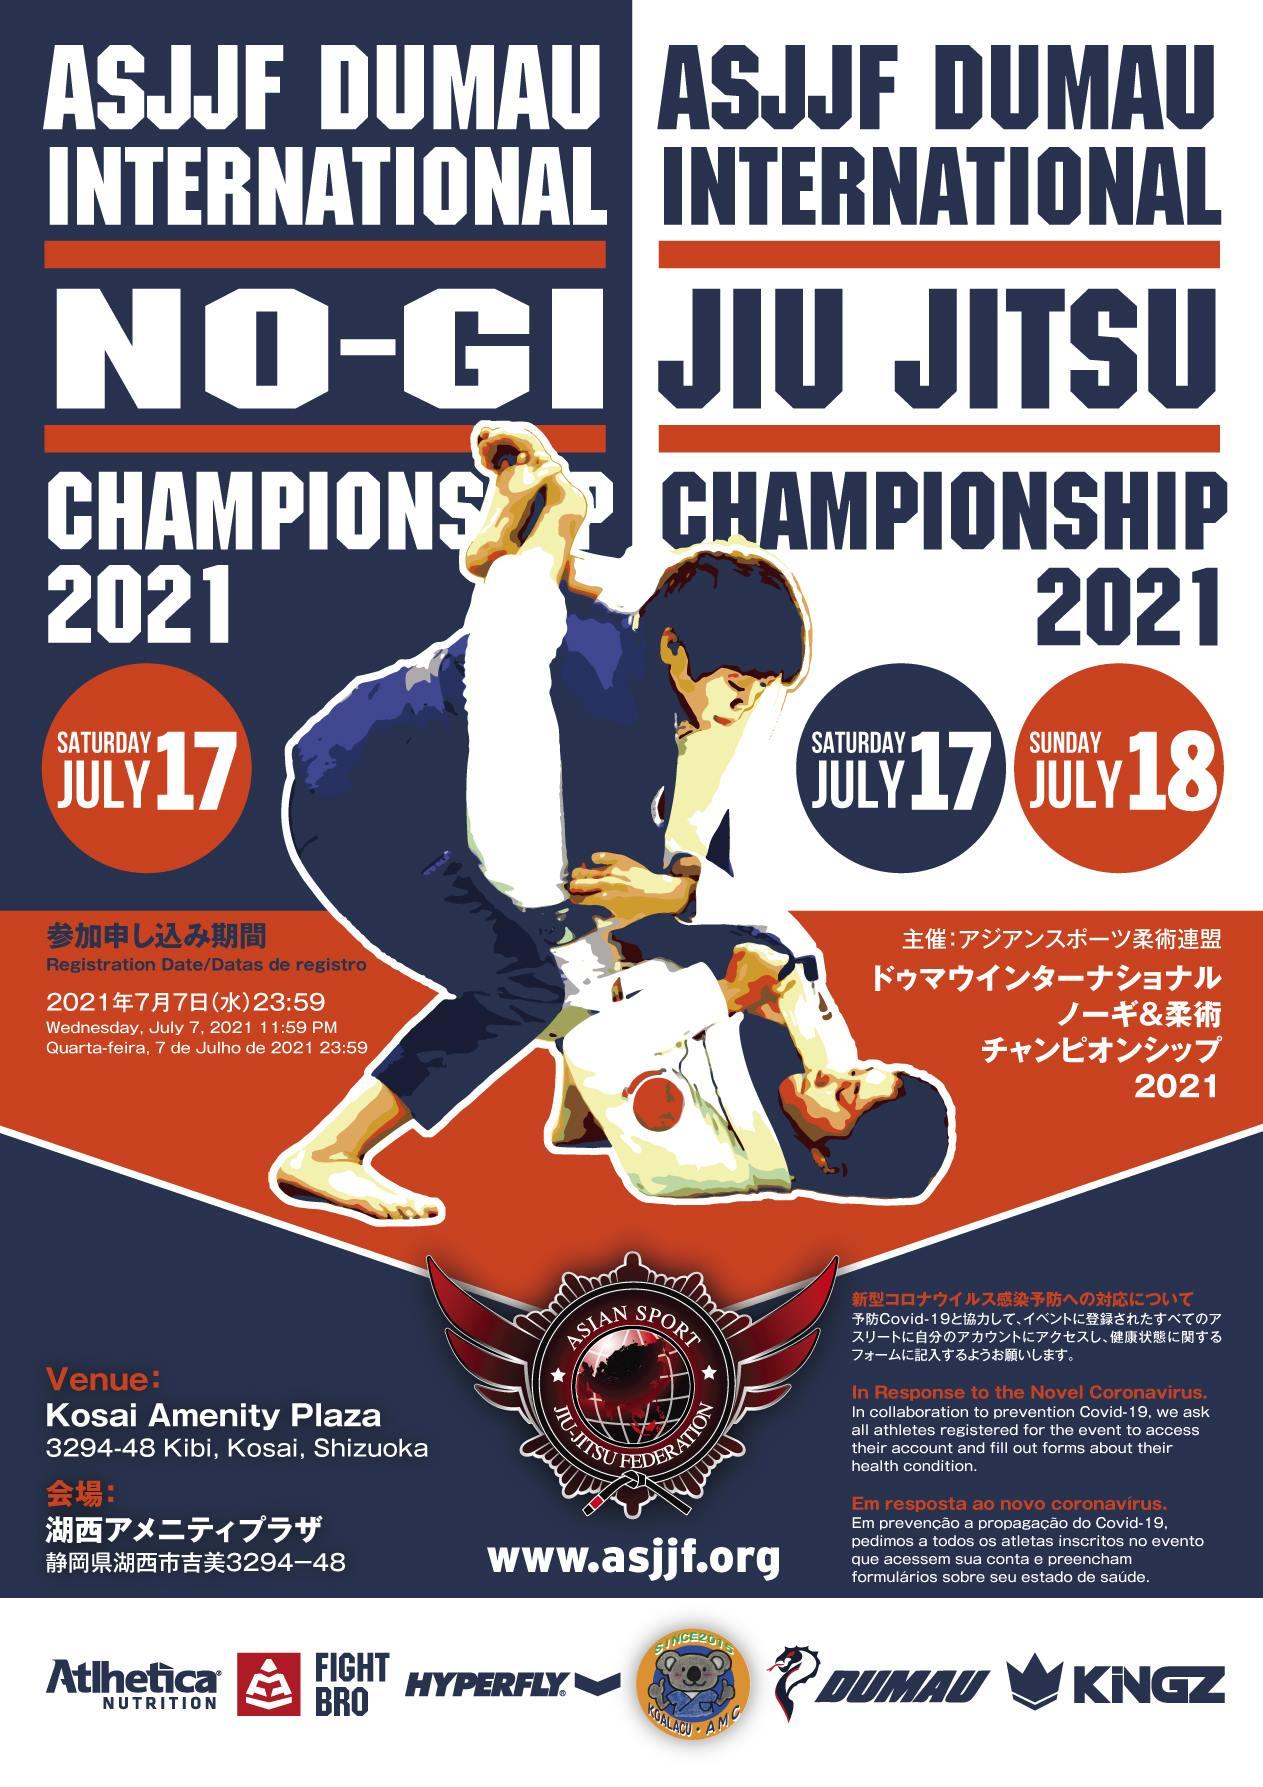 asjjf dumau international jiu jitsu championship 2021 (第17回ドゥマウインターナショナル柔術チャンピオンシップ)